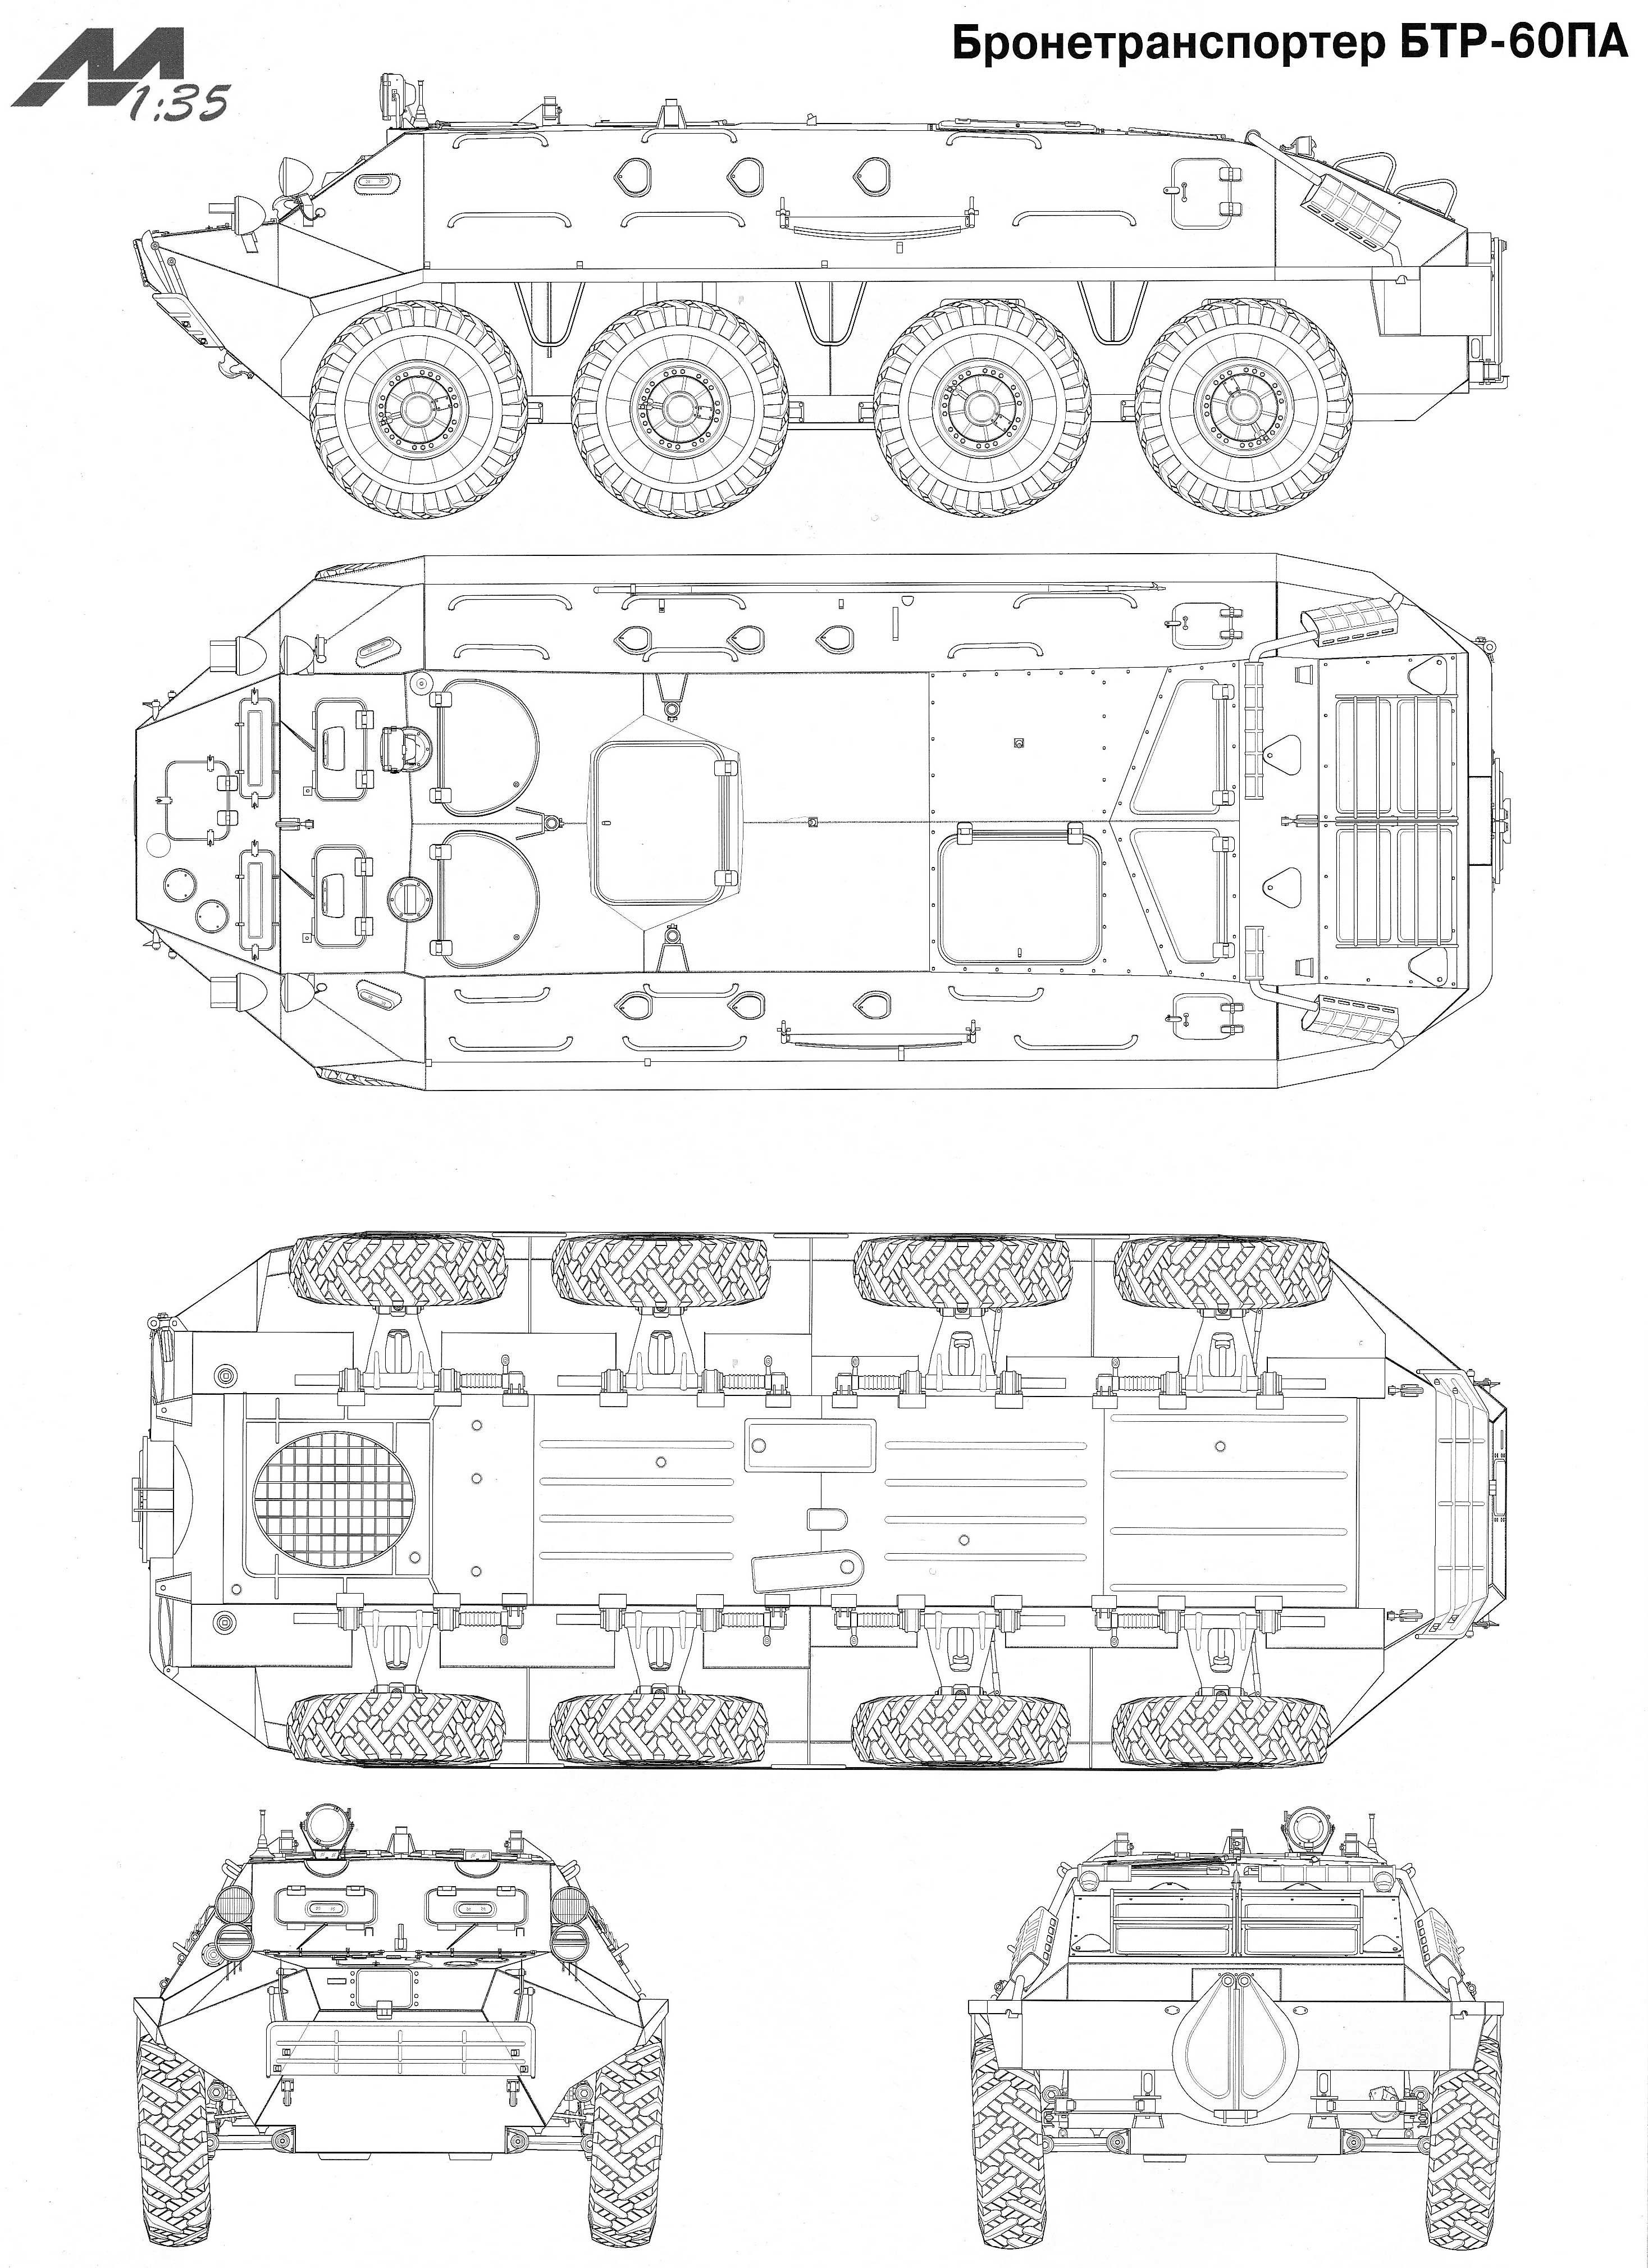 http://drawingdatabase.com/wp-content/uploads/2015/01/BTR_60PA_1963 ...